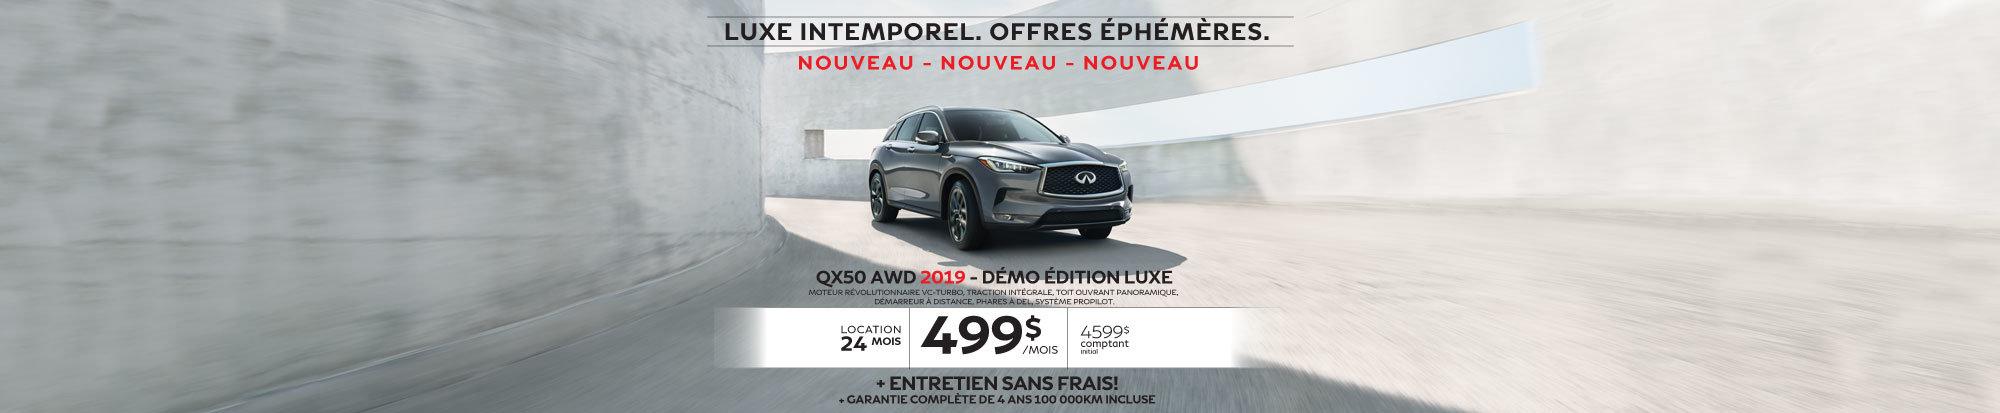 QX50 AWD 2019 Démo édition LUXE web